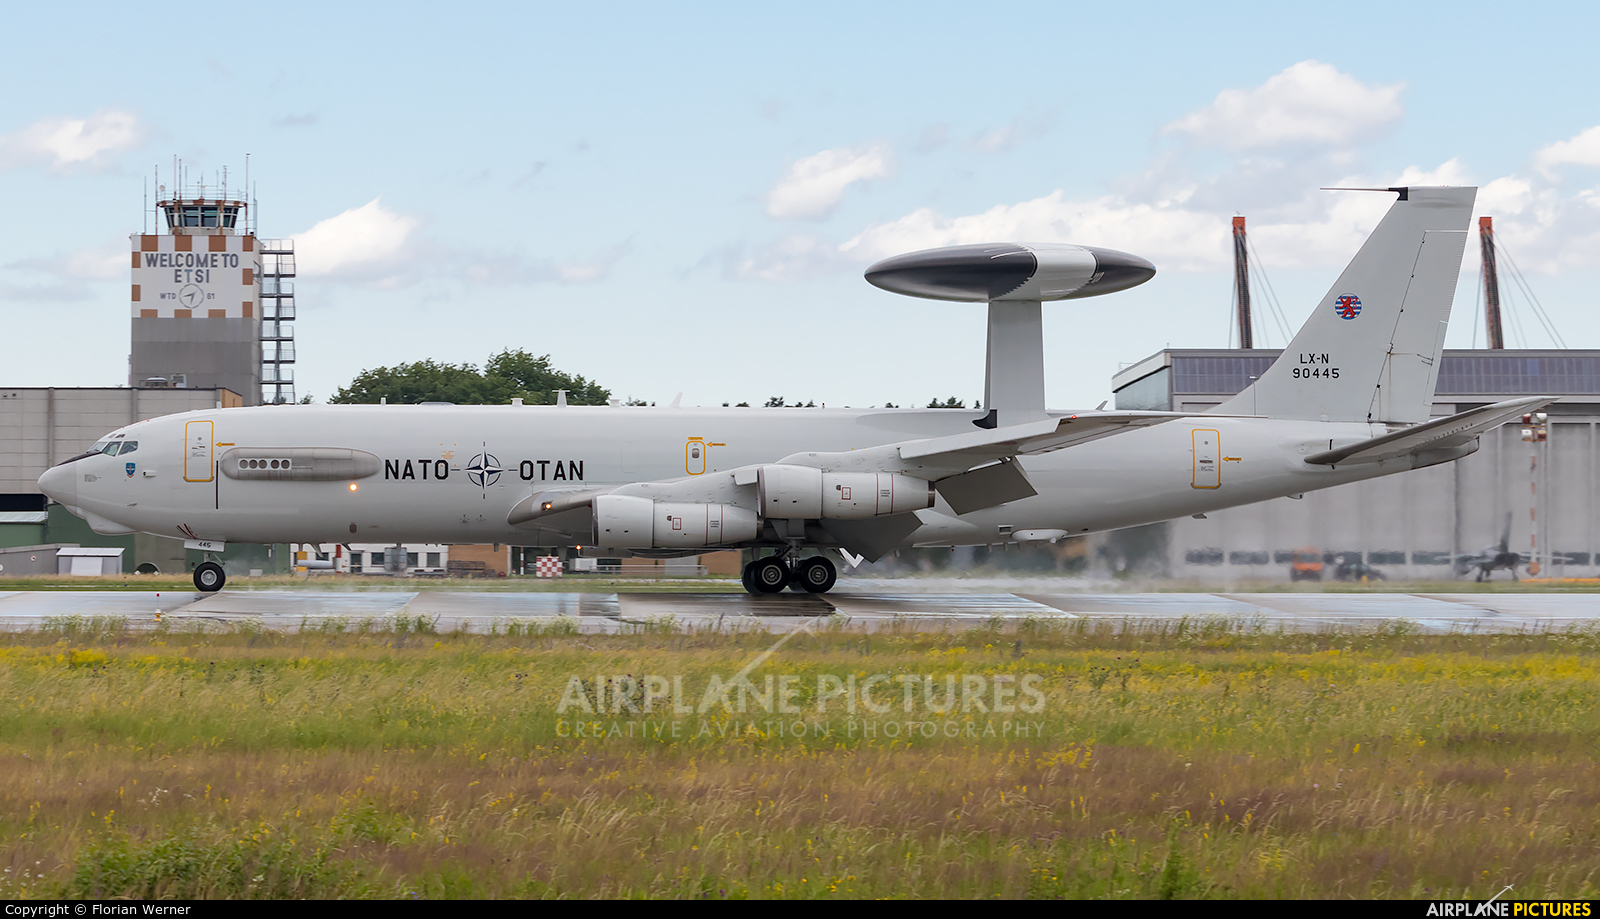 NATO LX-N90445 aircraft at Ingolstadt - Manching